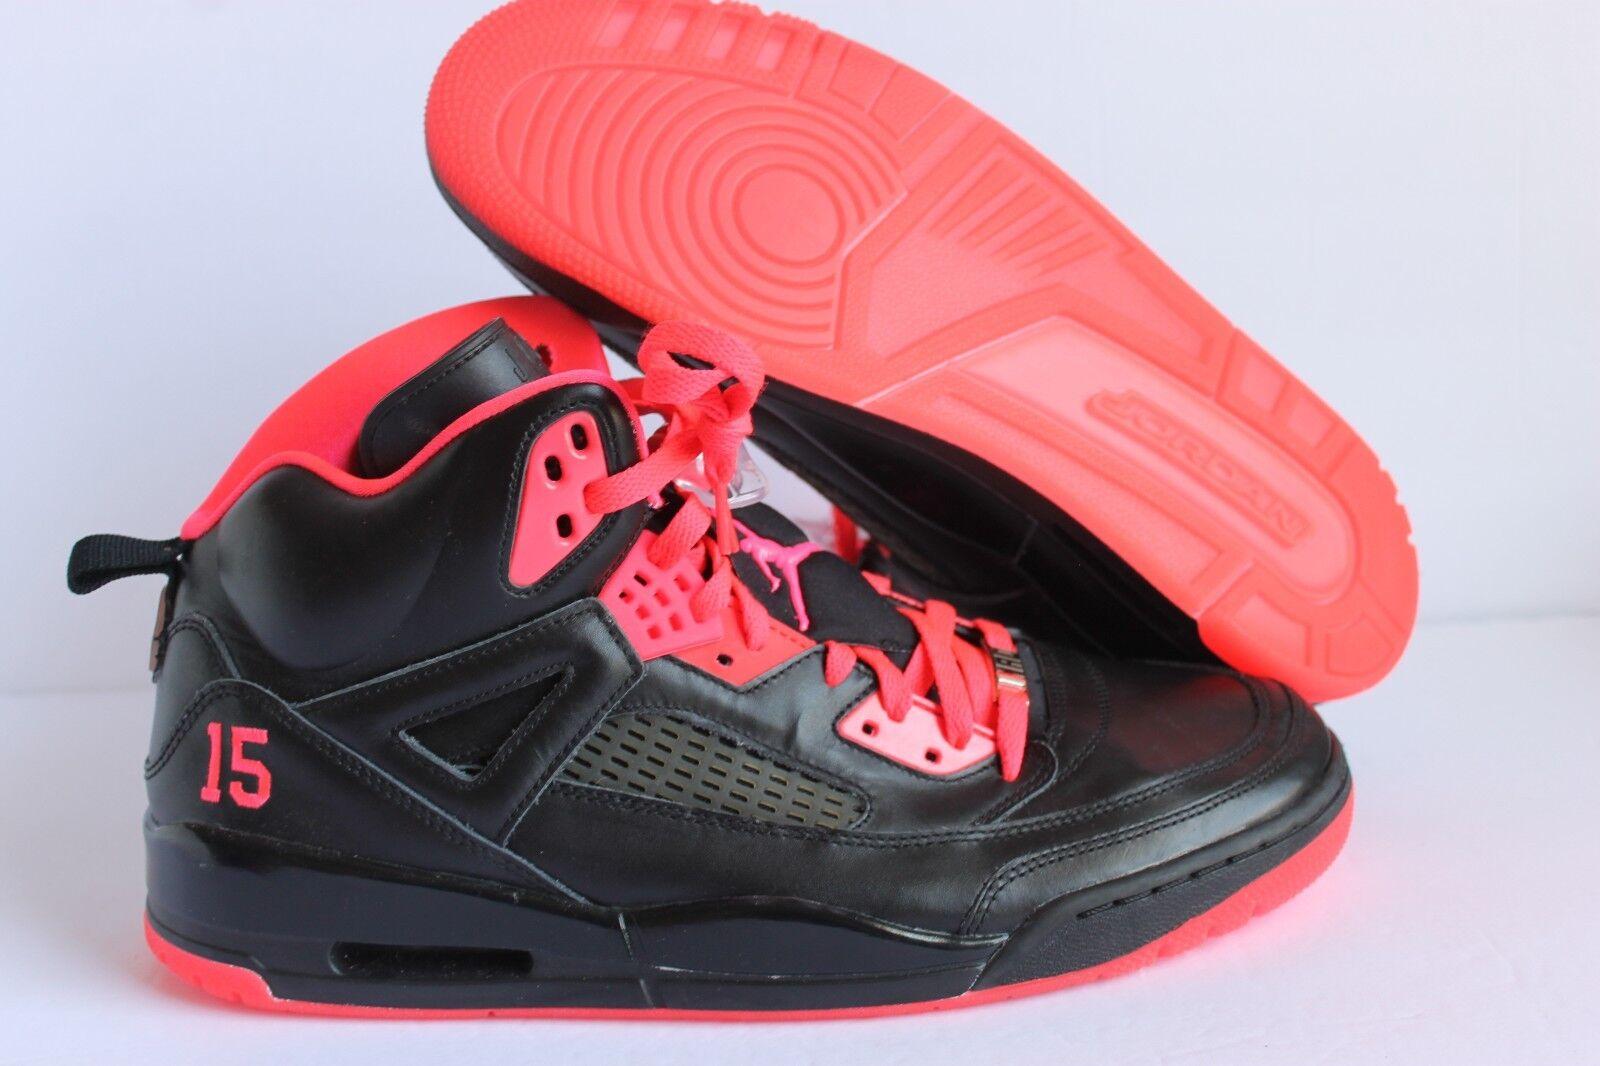 Nike air jordan spizike sz id nero-hot rosa sz spizike 14 c7a158